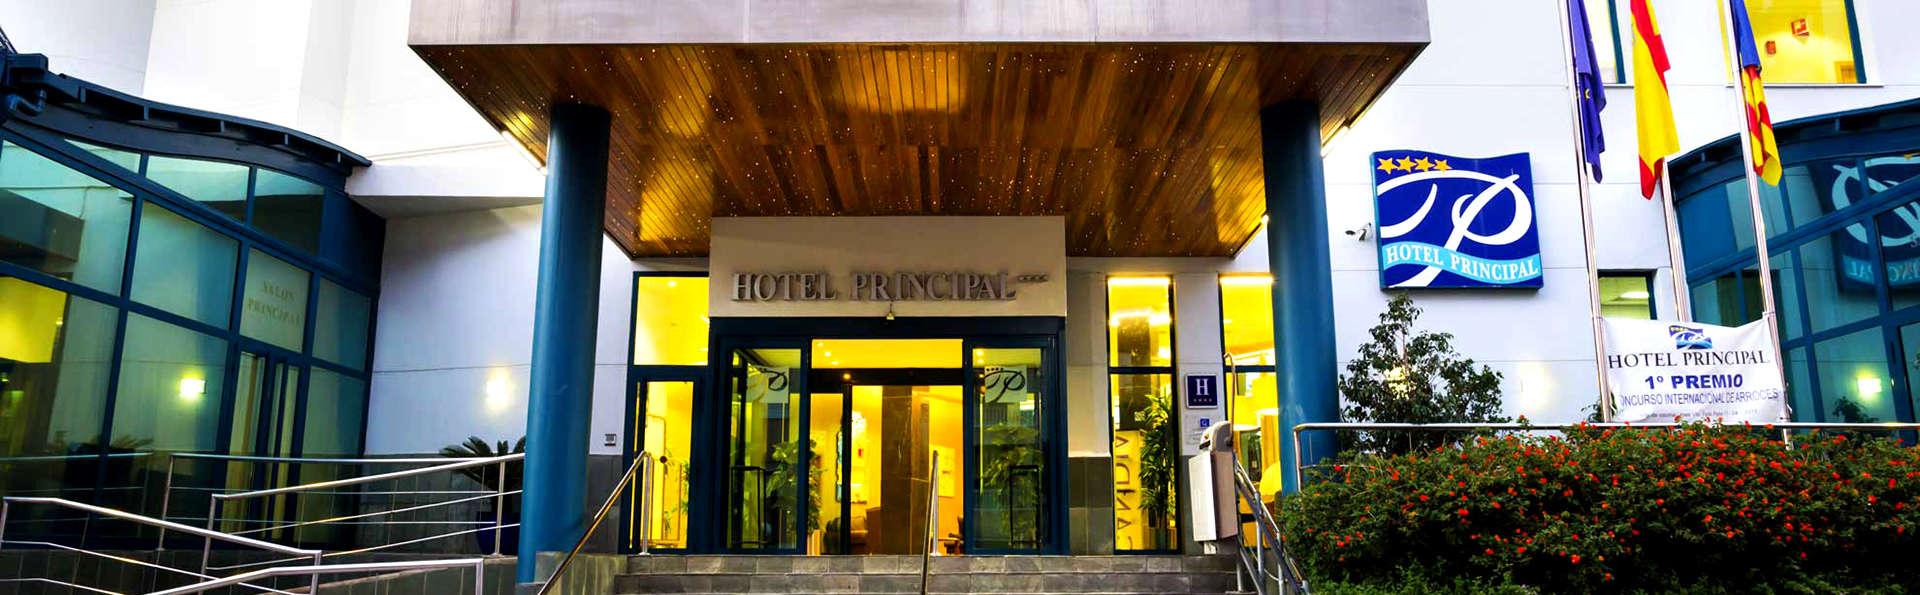 Hotel Principal - Edit_Front2.jpg